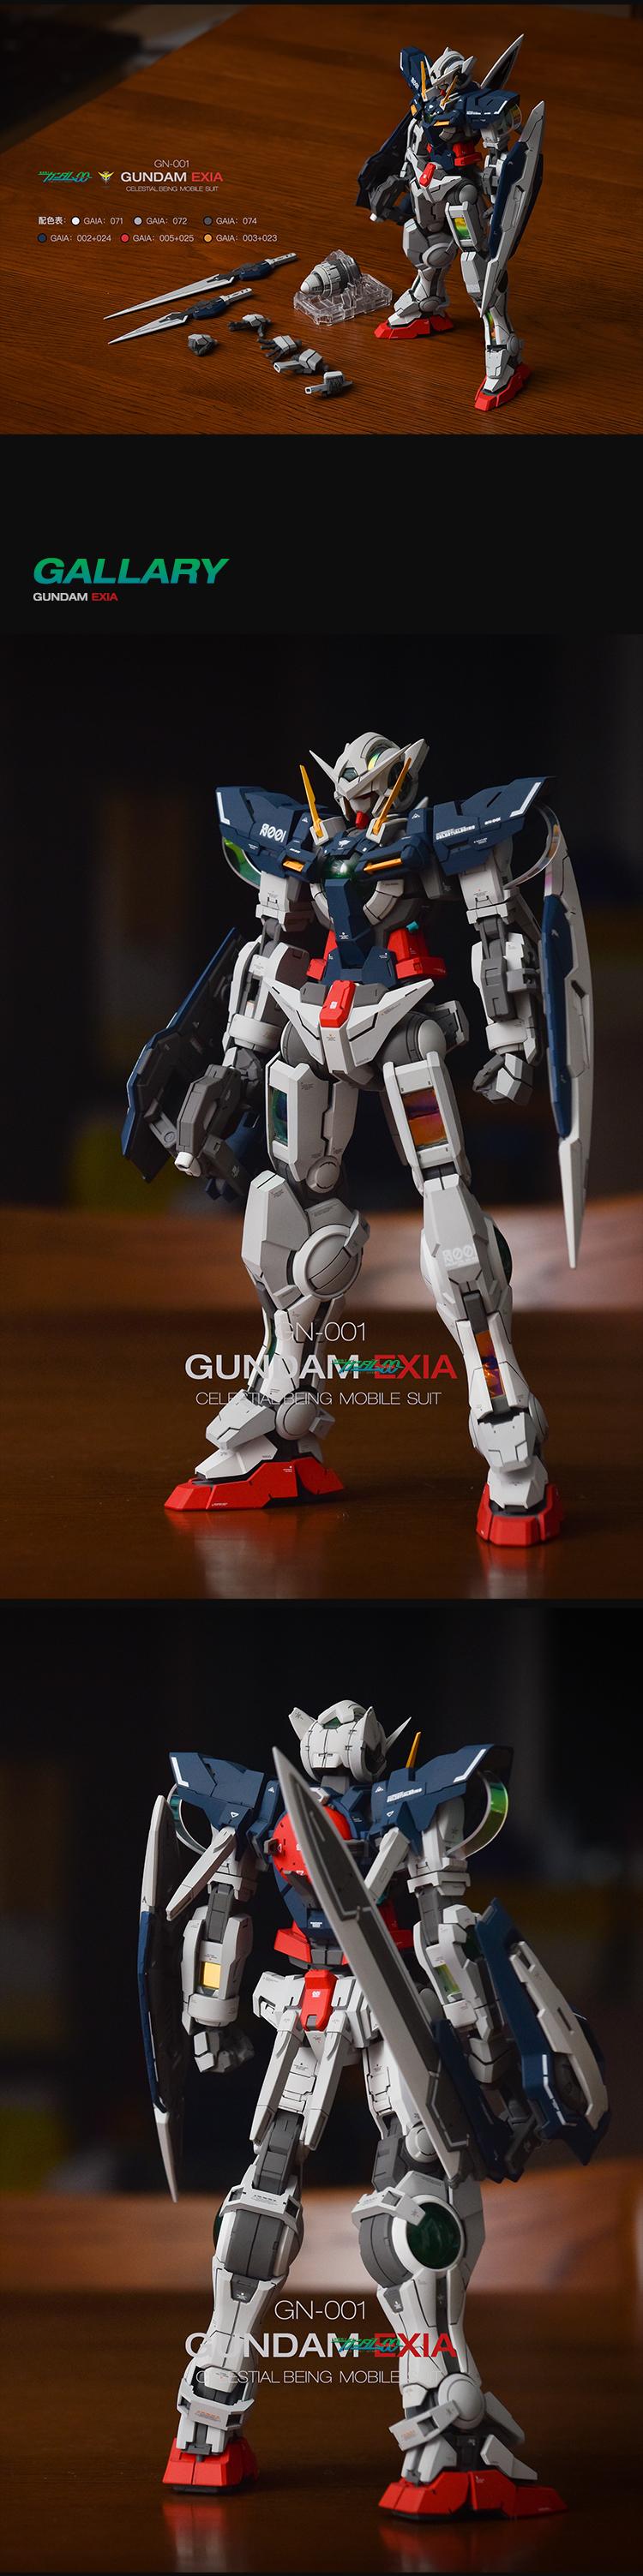 G785_Topless_MG_EXIA_GK_010.jpg